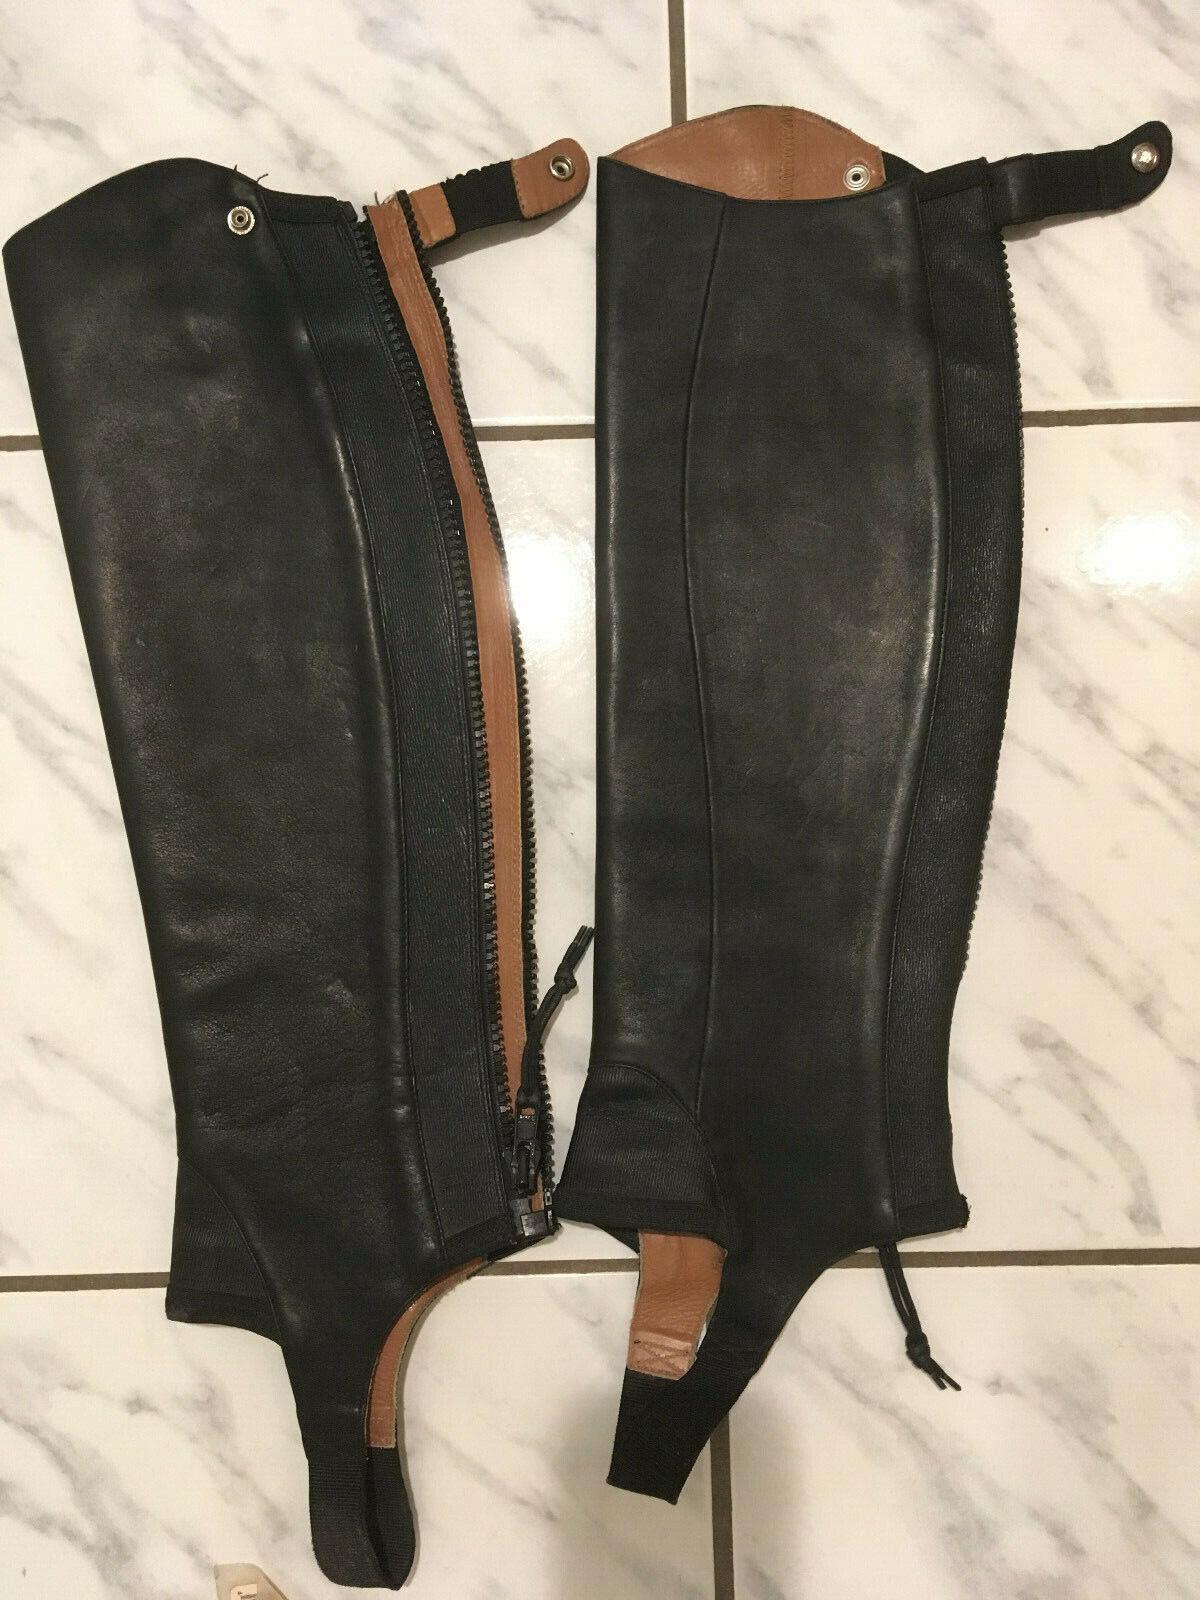 Ariat schwarz close contact leather half chaps Größe ST full length zipper